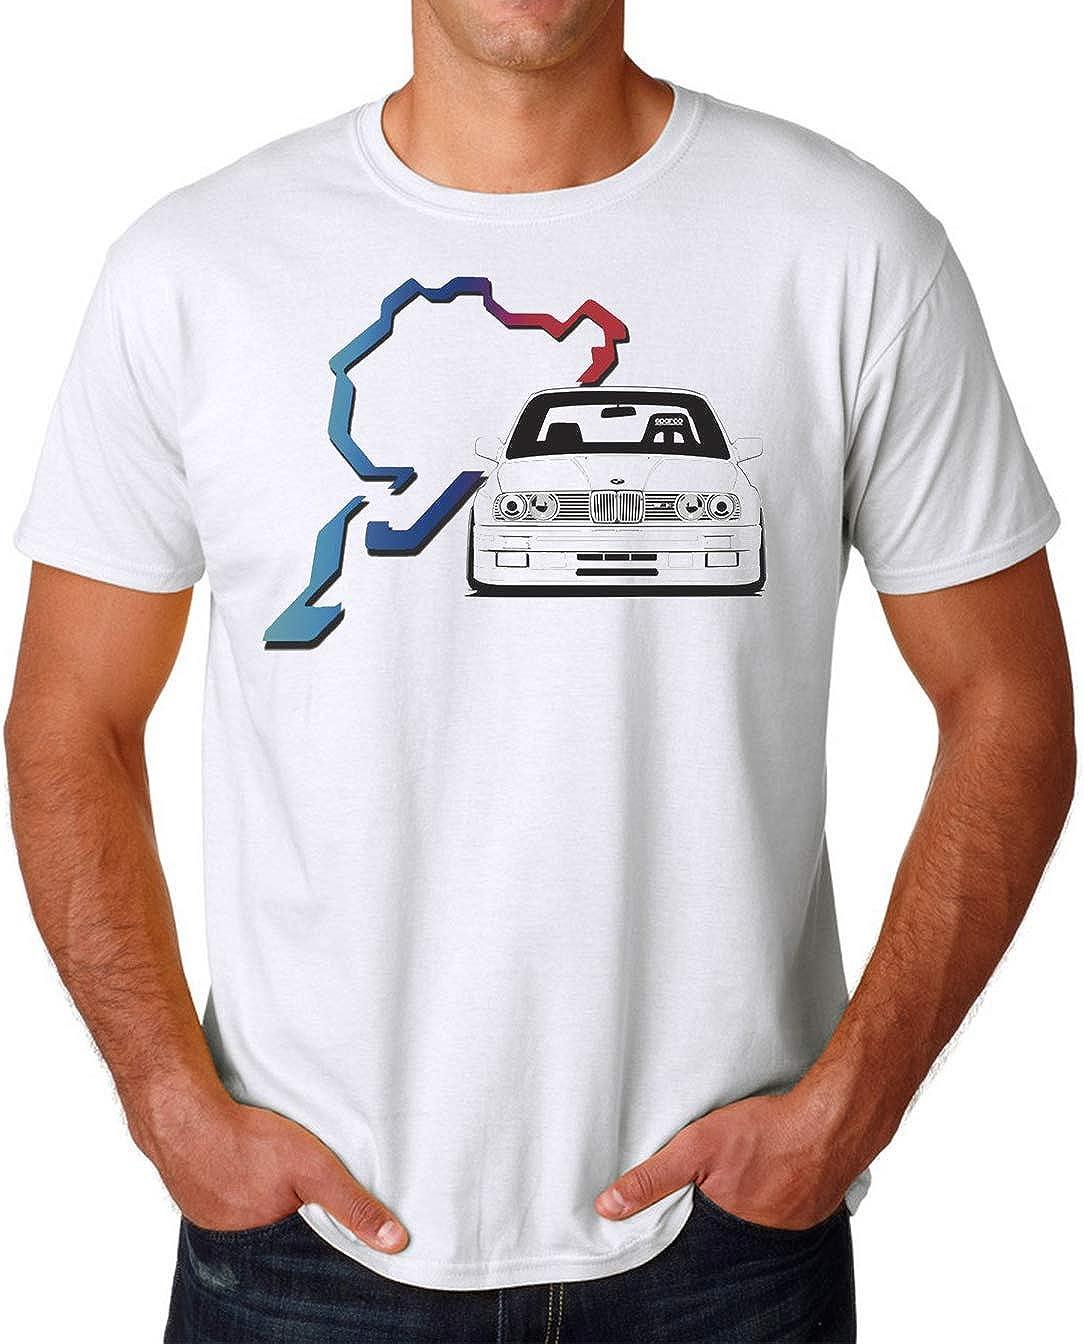 PasTomka E30 Nurburgring Bimmer Mens T-Shirt Hombre Camiseta ...